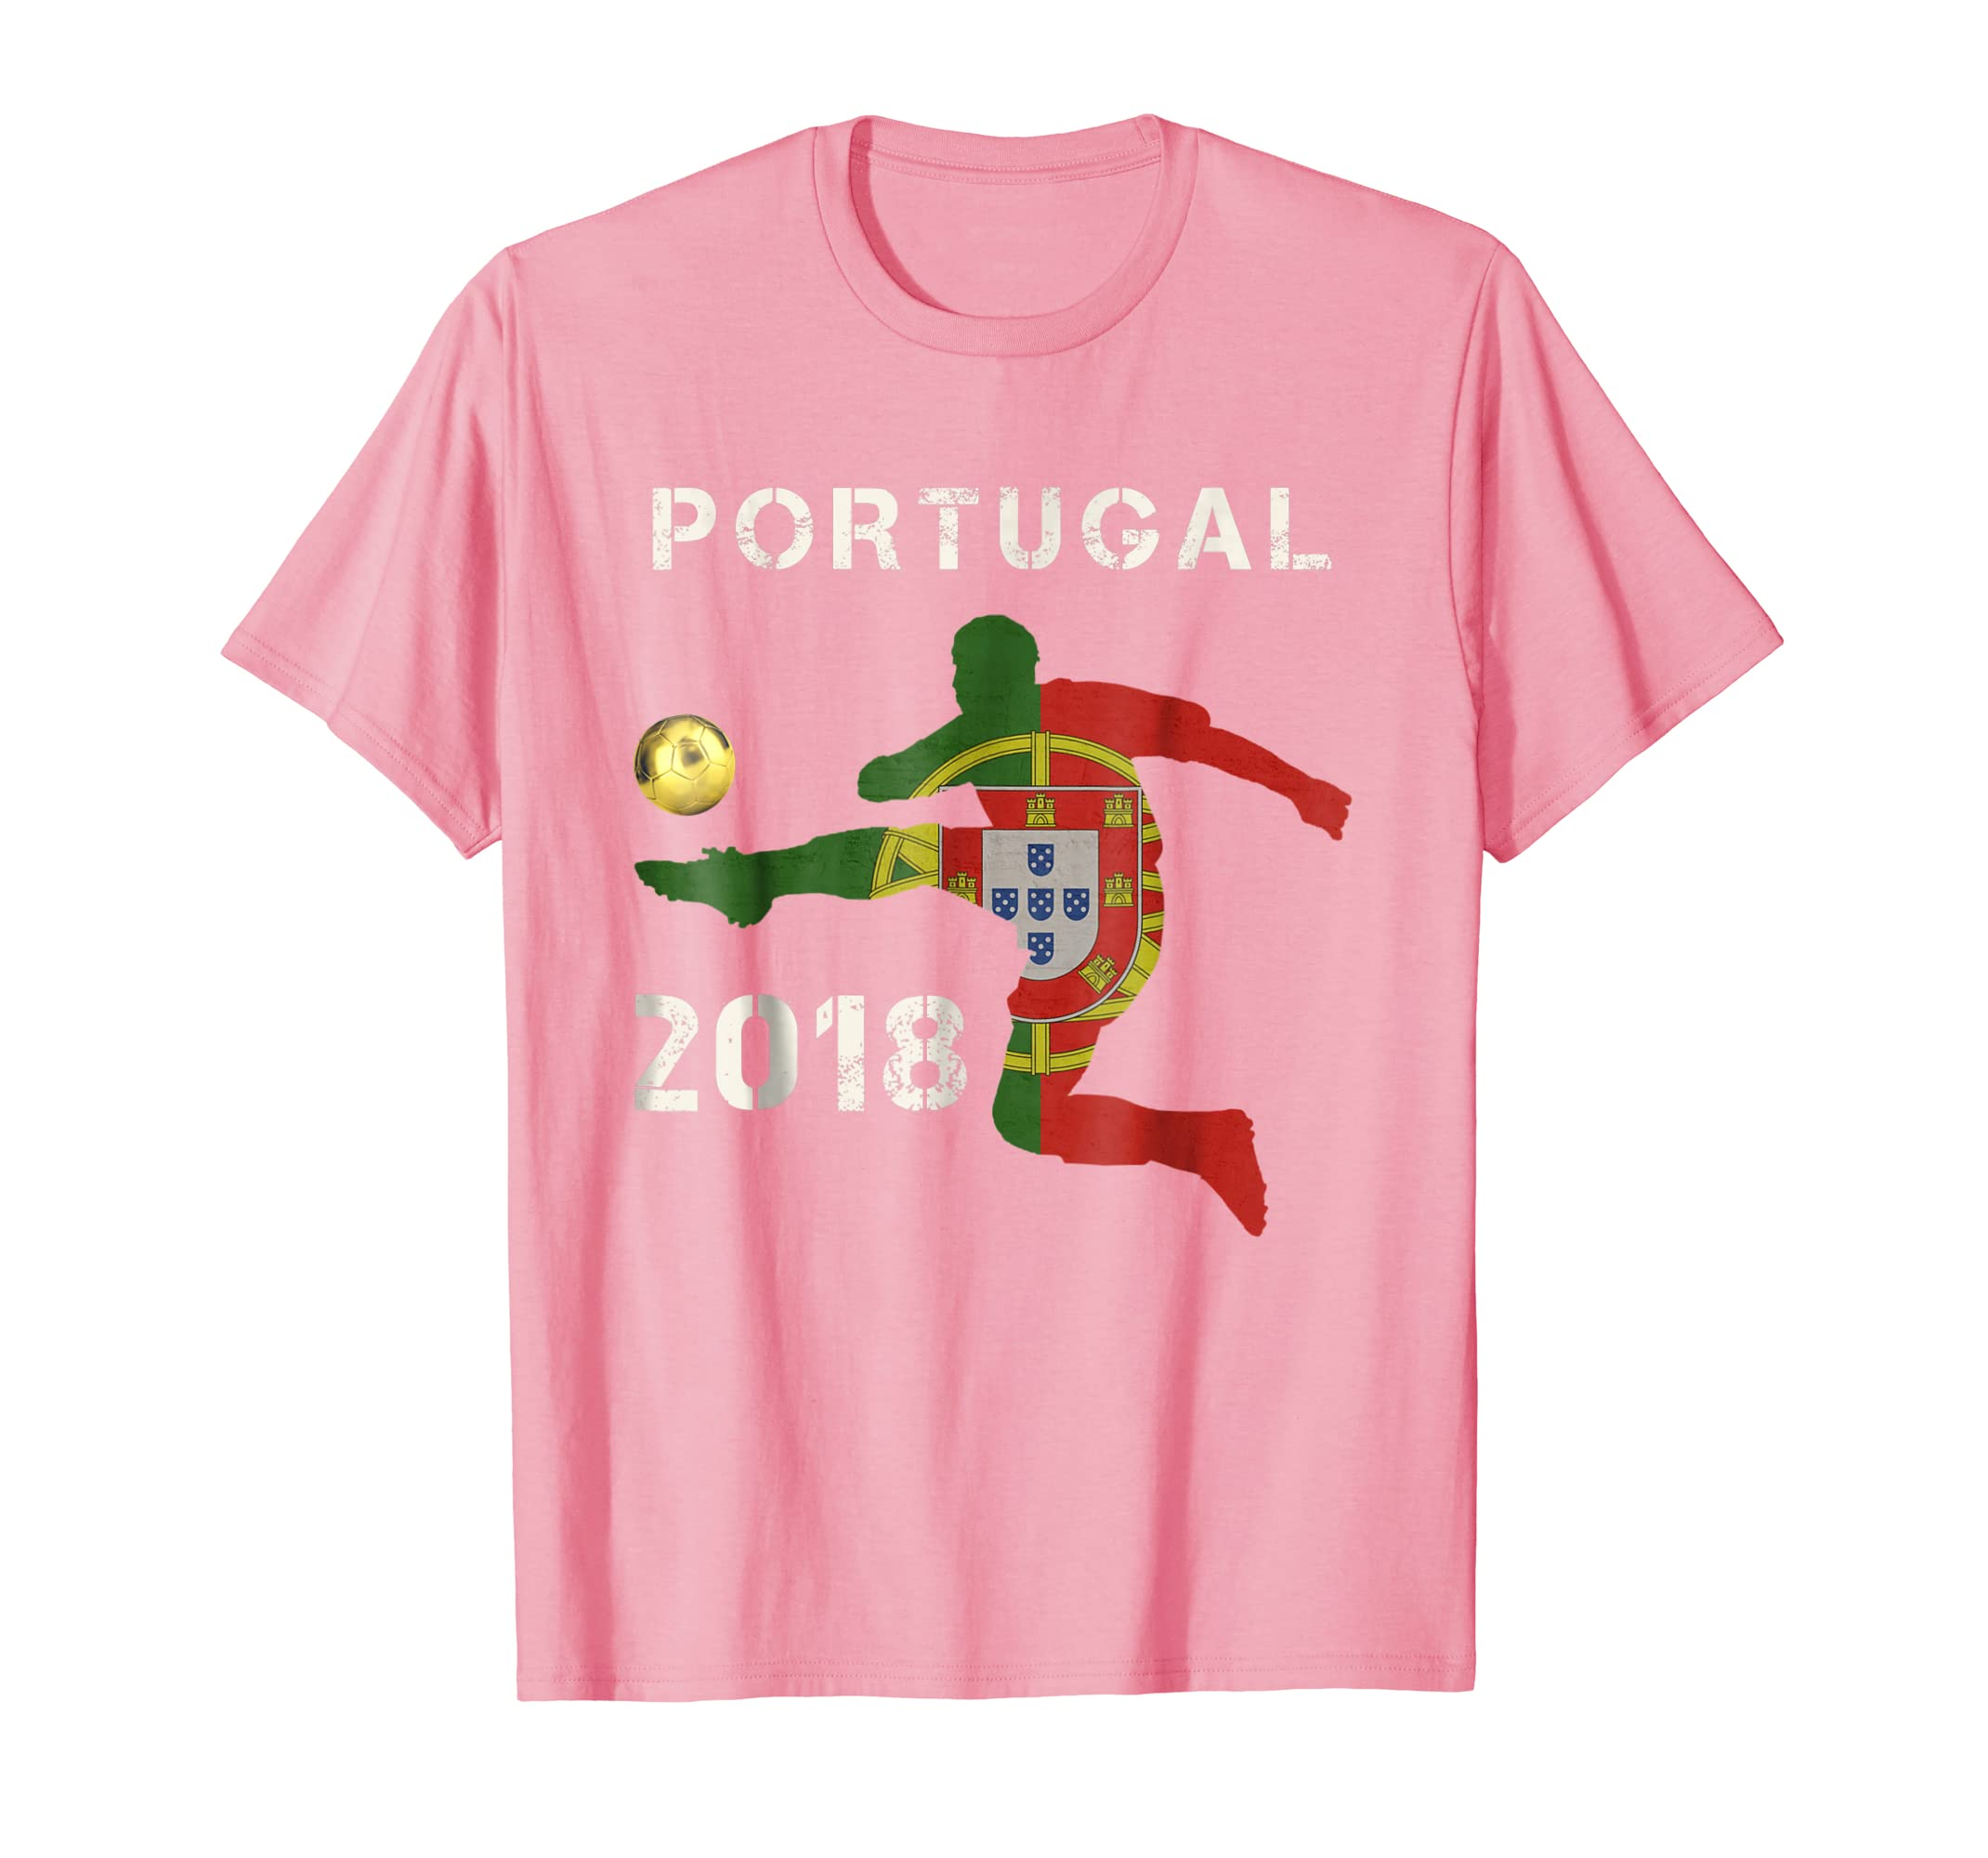 russia prt portugal world soccer 2018 t shirt cup fan. Black Bedroom Furniture Sets. Home Design Ideas